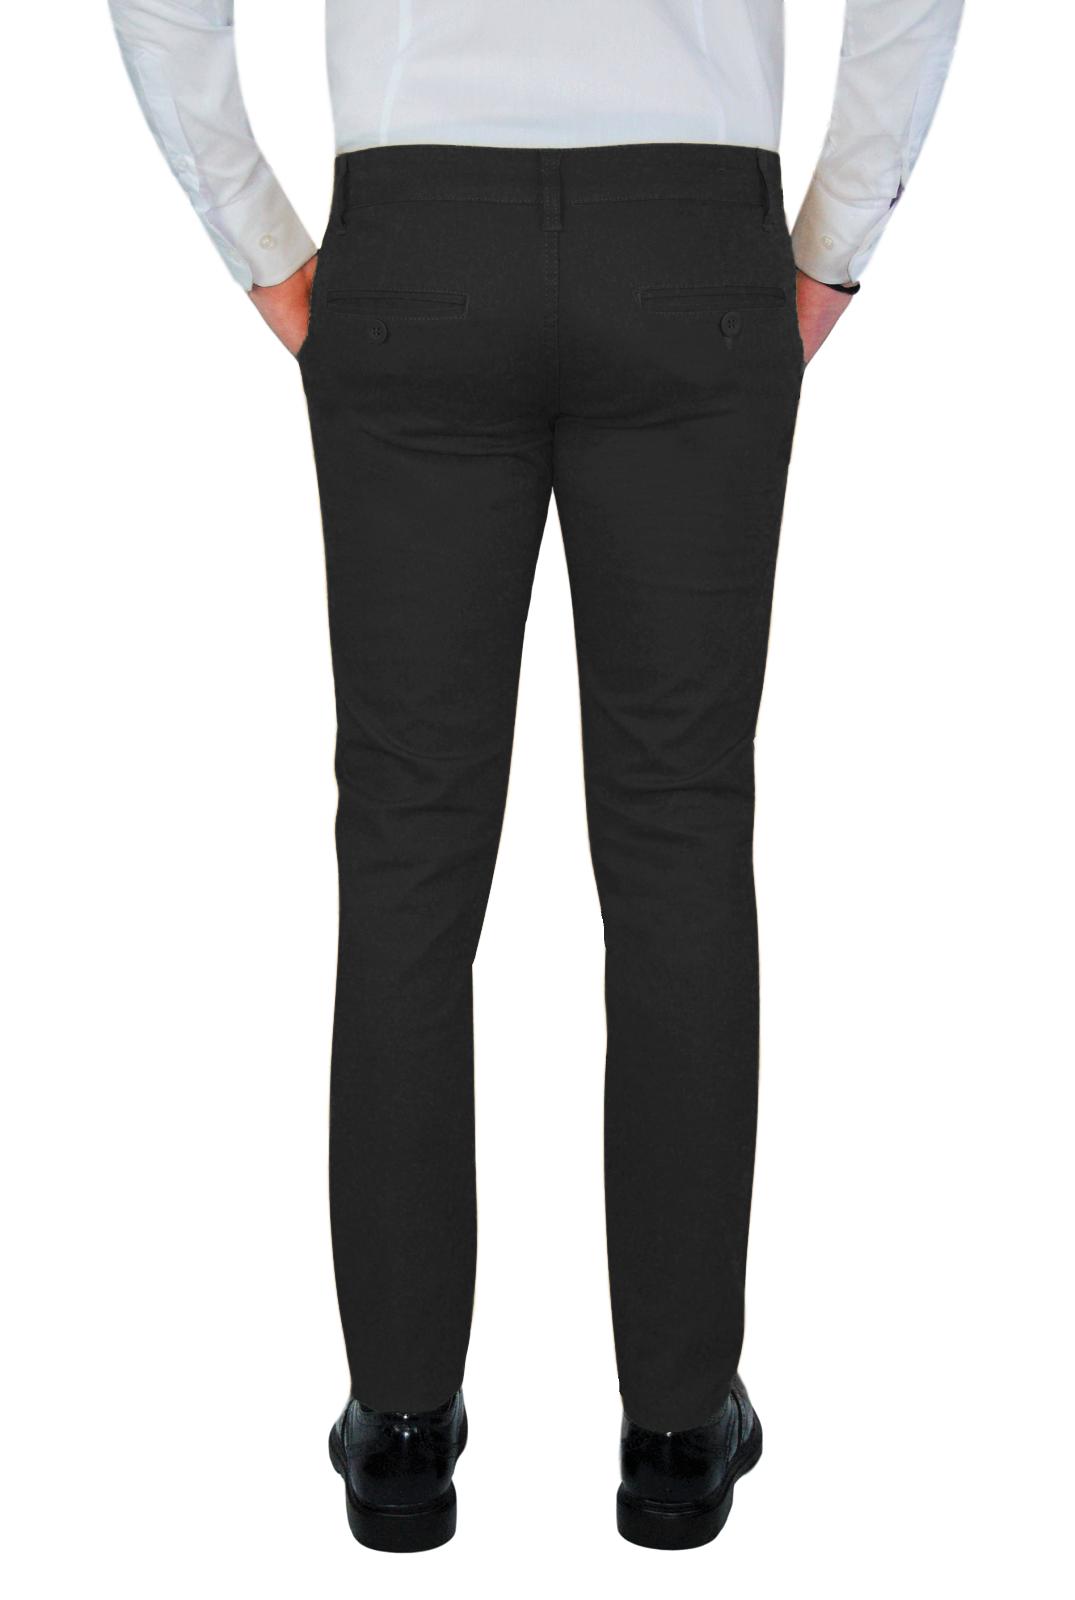 Pantalone-Uomo-Chino-Primaverile-slim-fit-Pantaloni-Eleganti-Blu-Verde-Nero miniatura 24